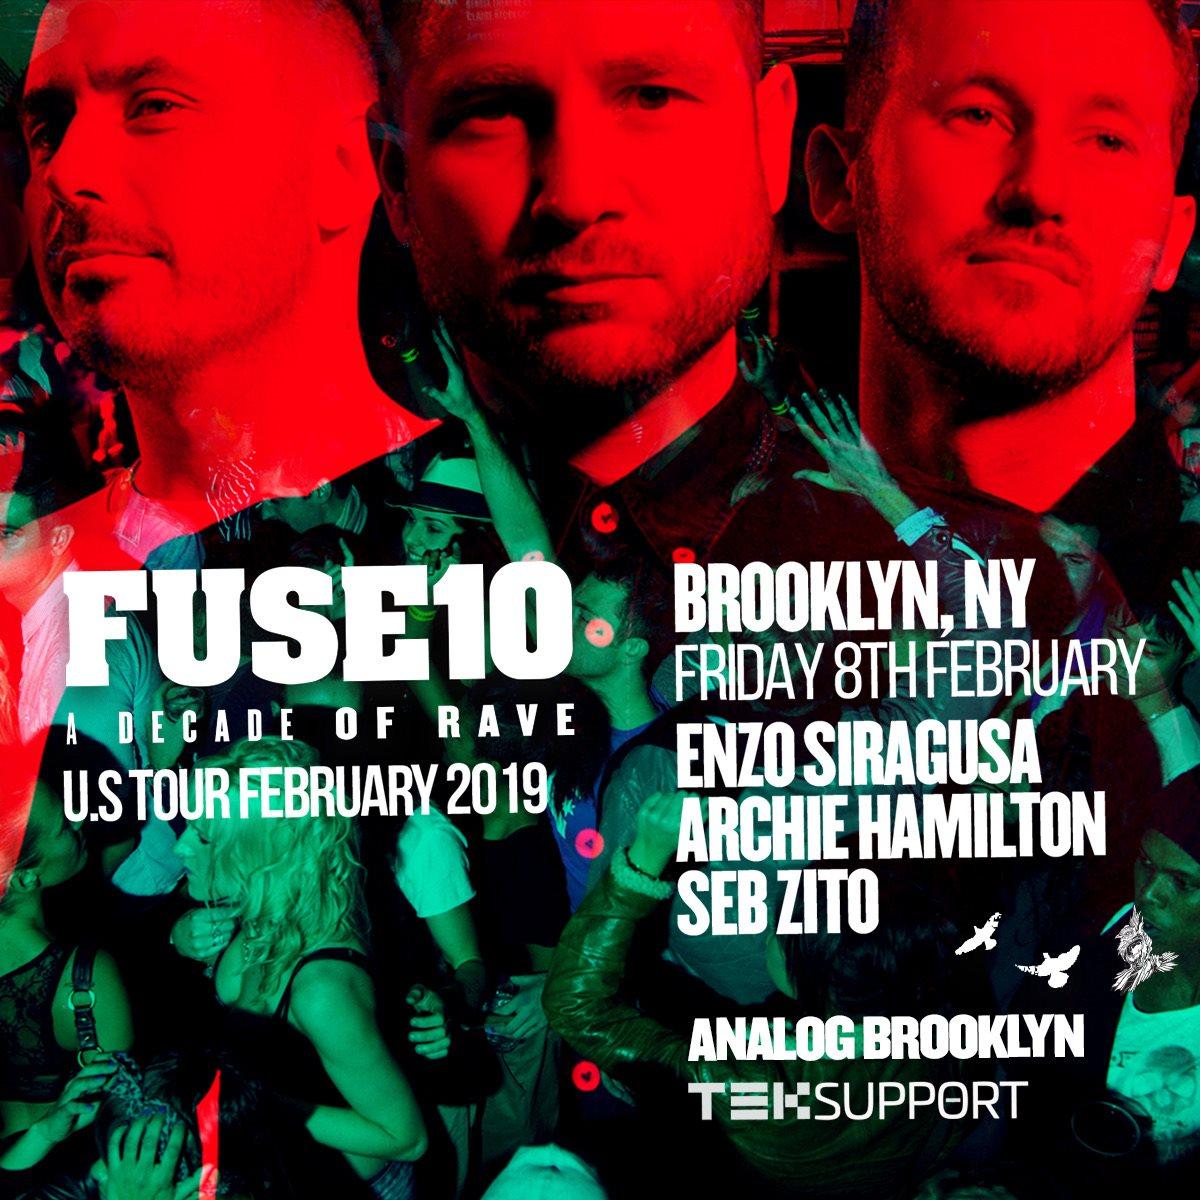 FUSE 10 Years - Brooklyn - Flyer back